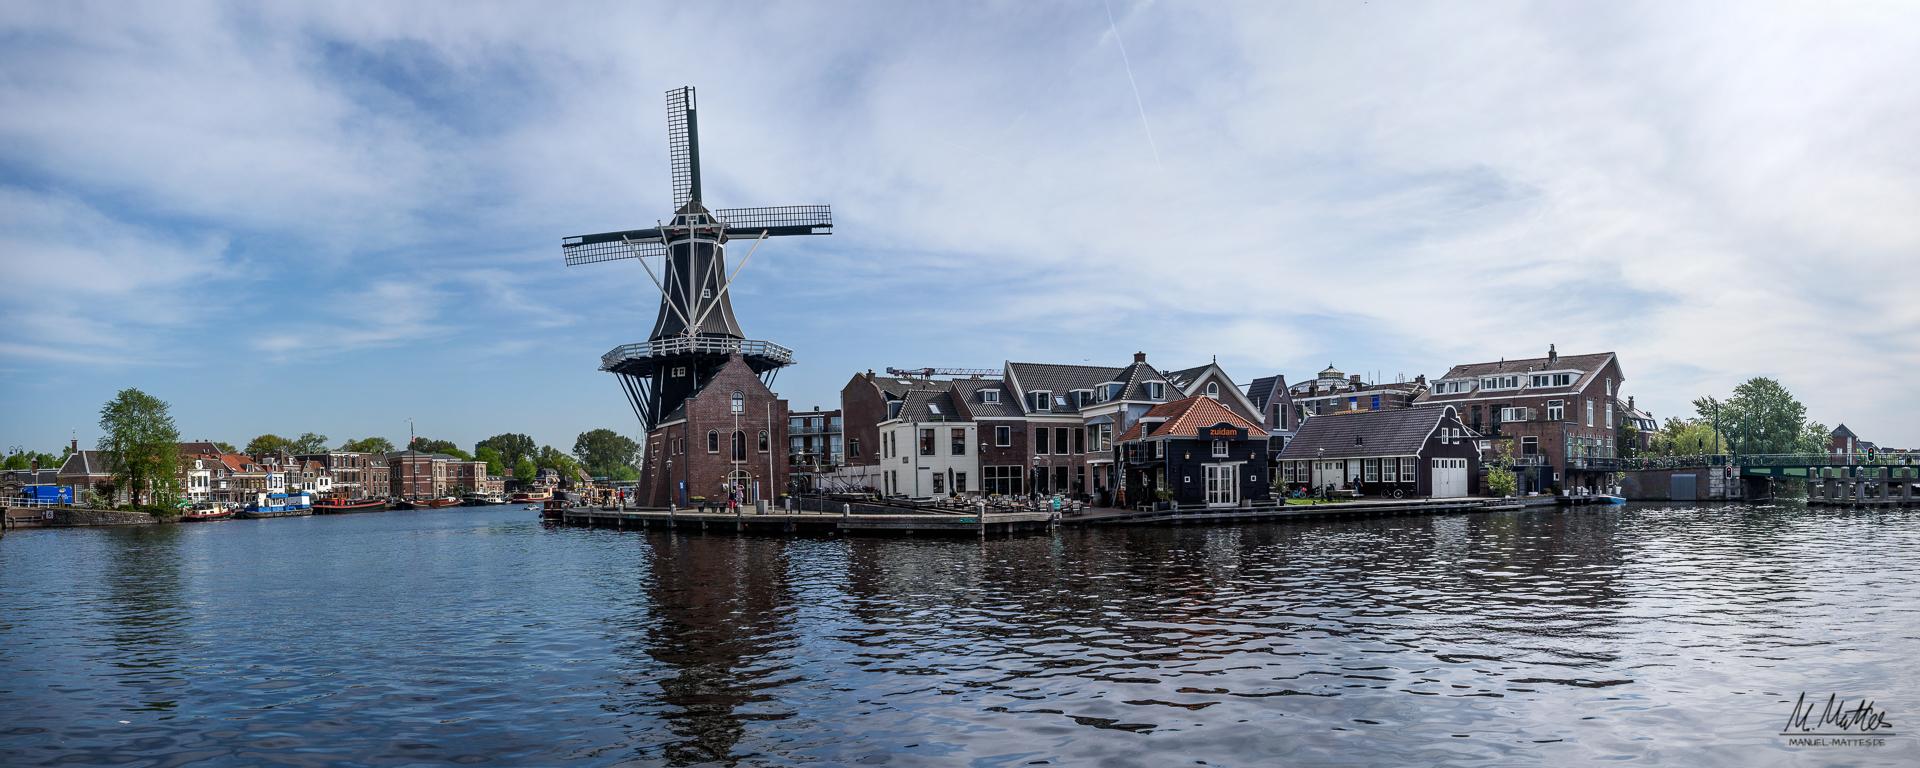 Haarlem April 2019